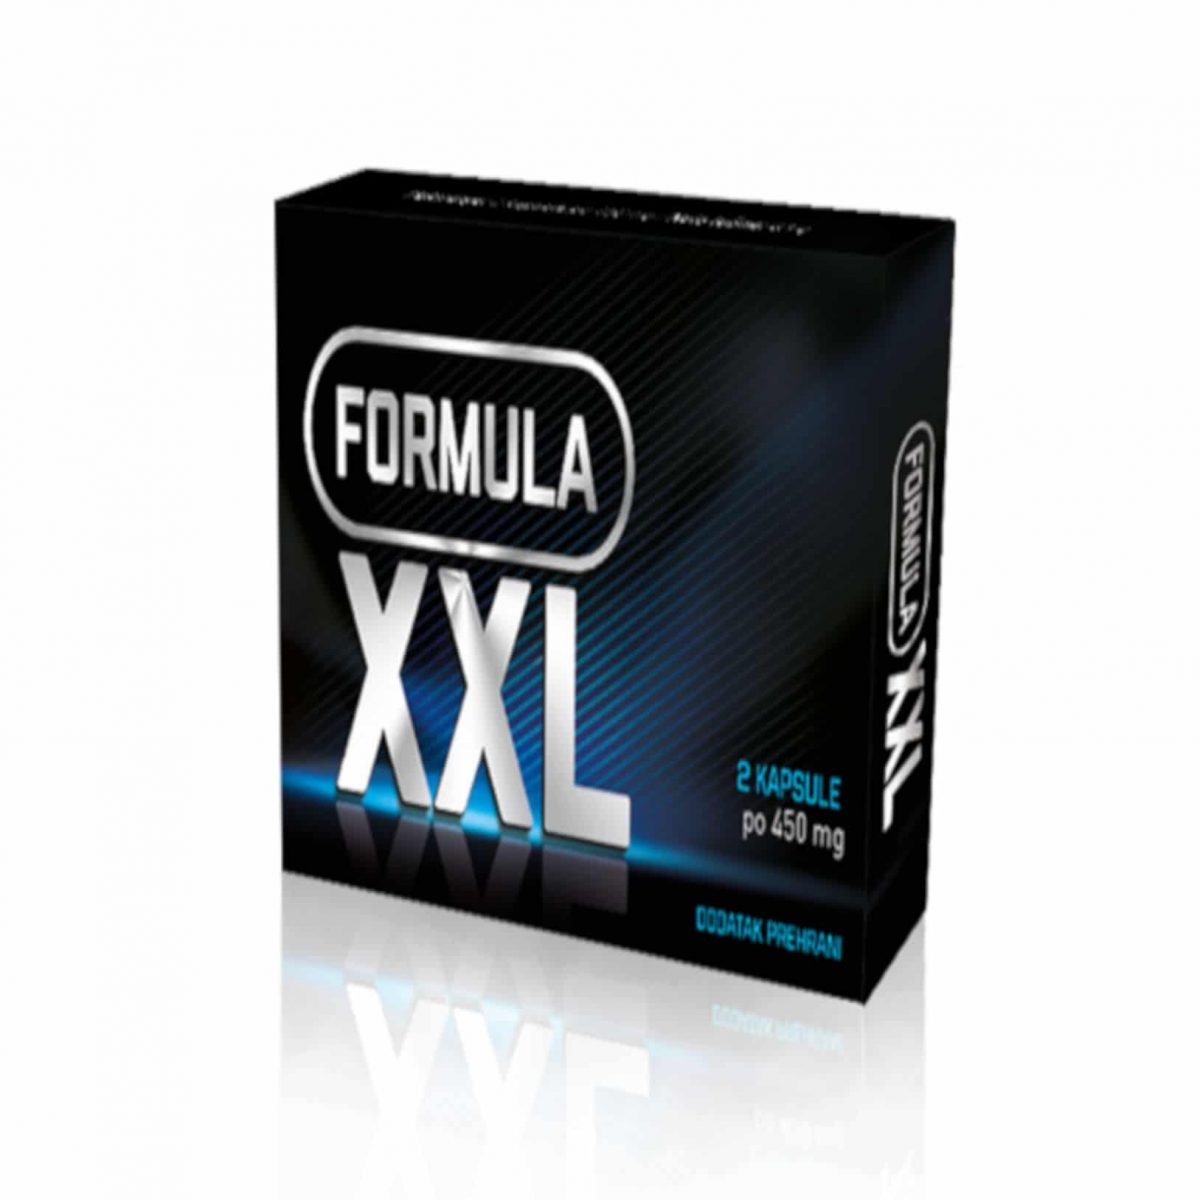 Formula XXL